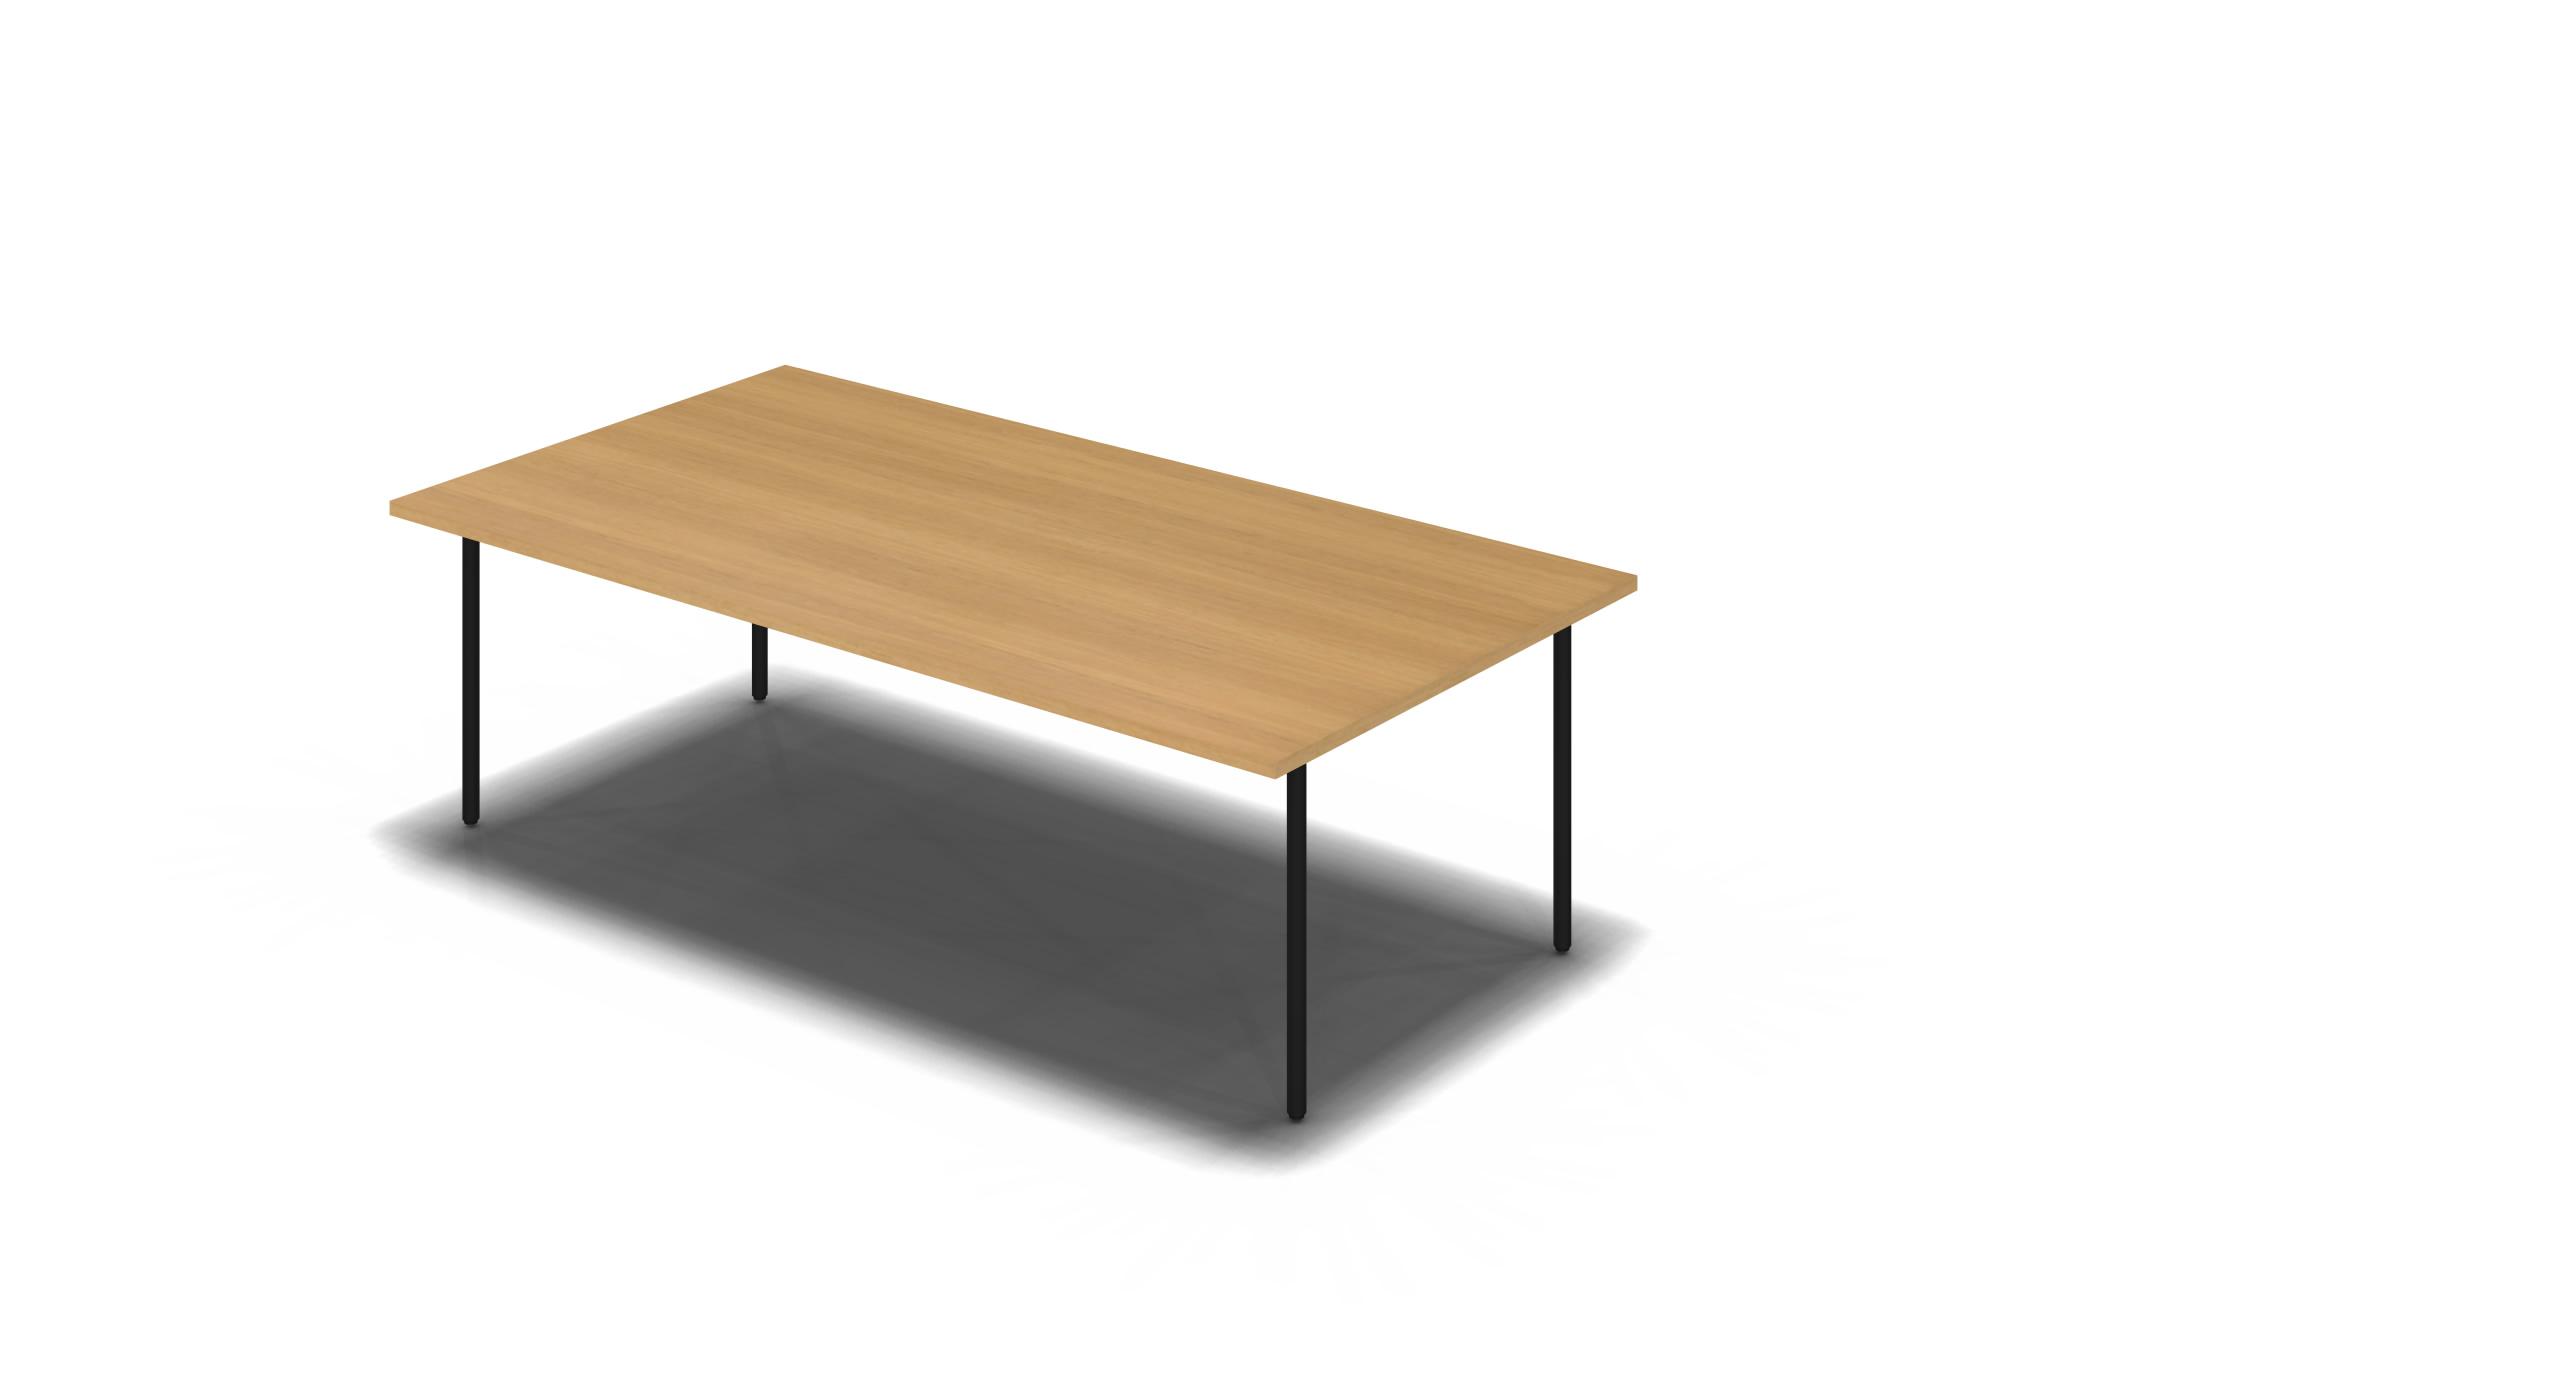 Table_Round_2100x1050_Black_Oak_noOption